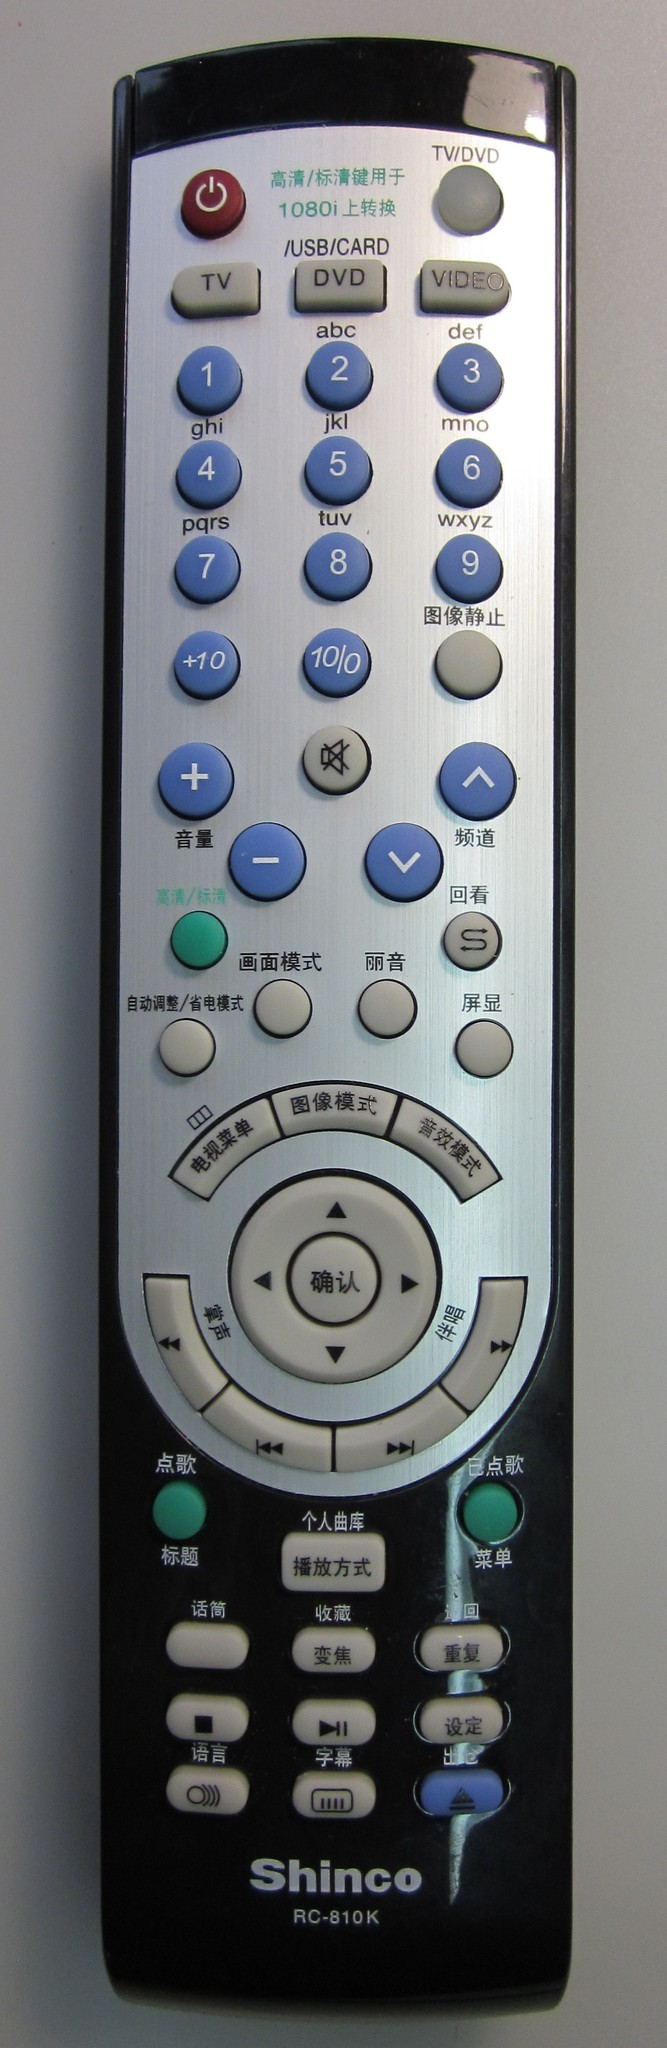 RC-810K пульт к телевизору SHINCO DTV-2630 с DVD-проигрывателем